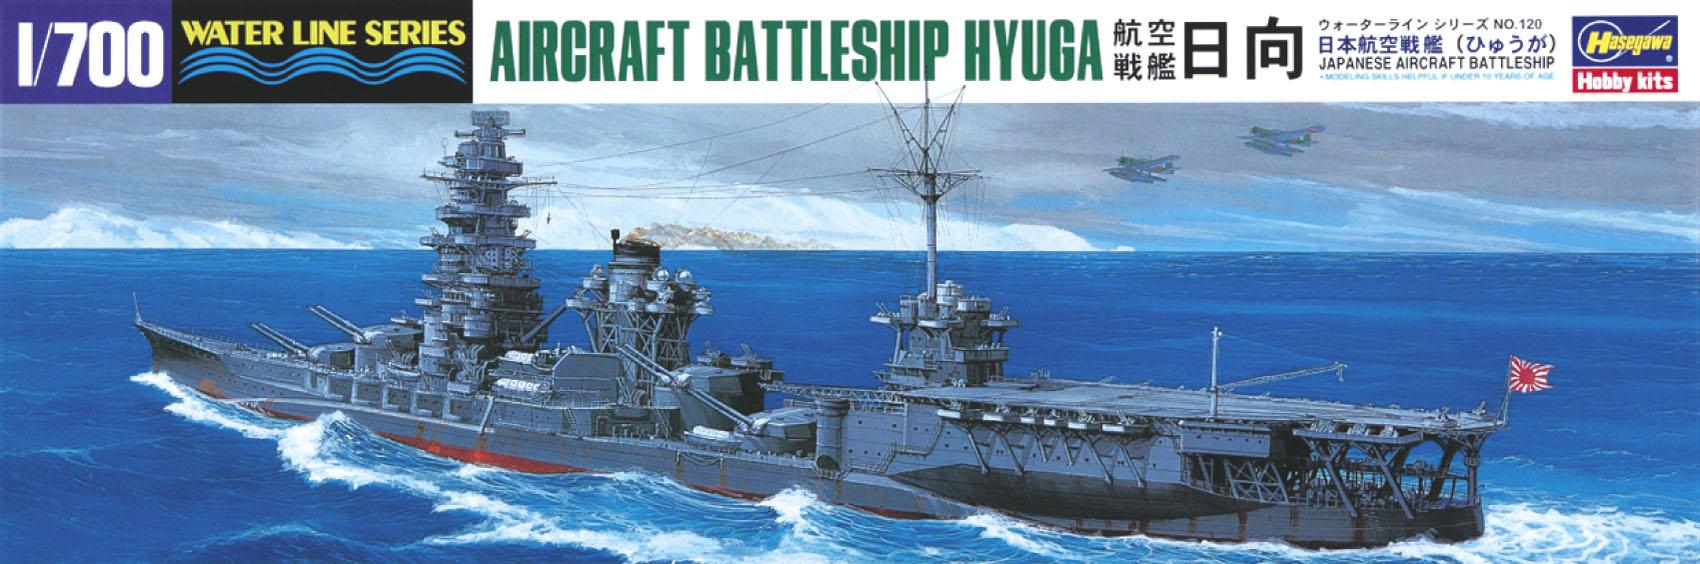 Hasegawa Ijn Aircraft Battleship Hyuga